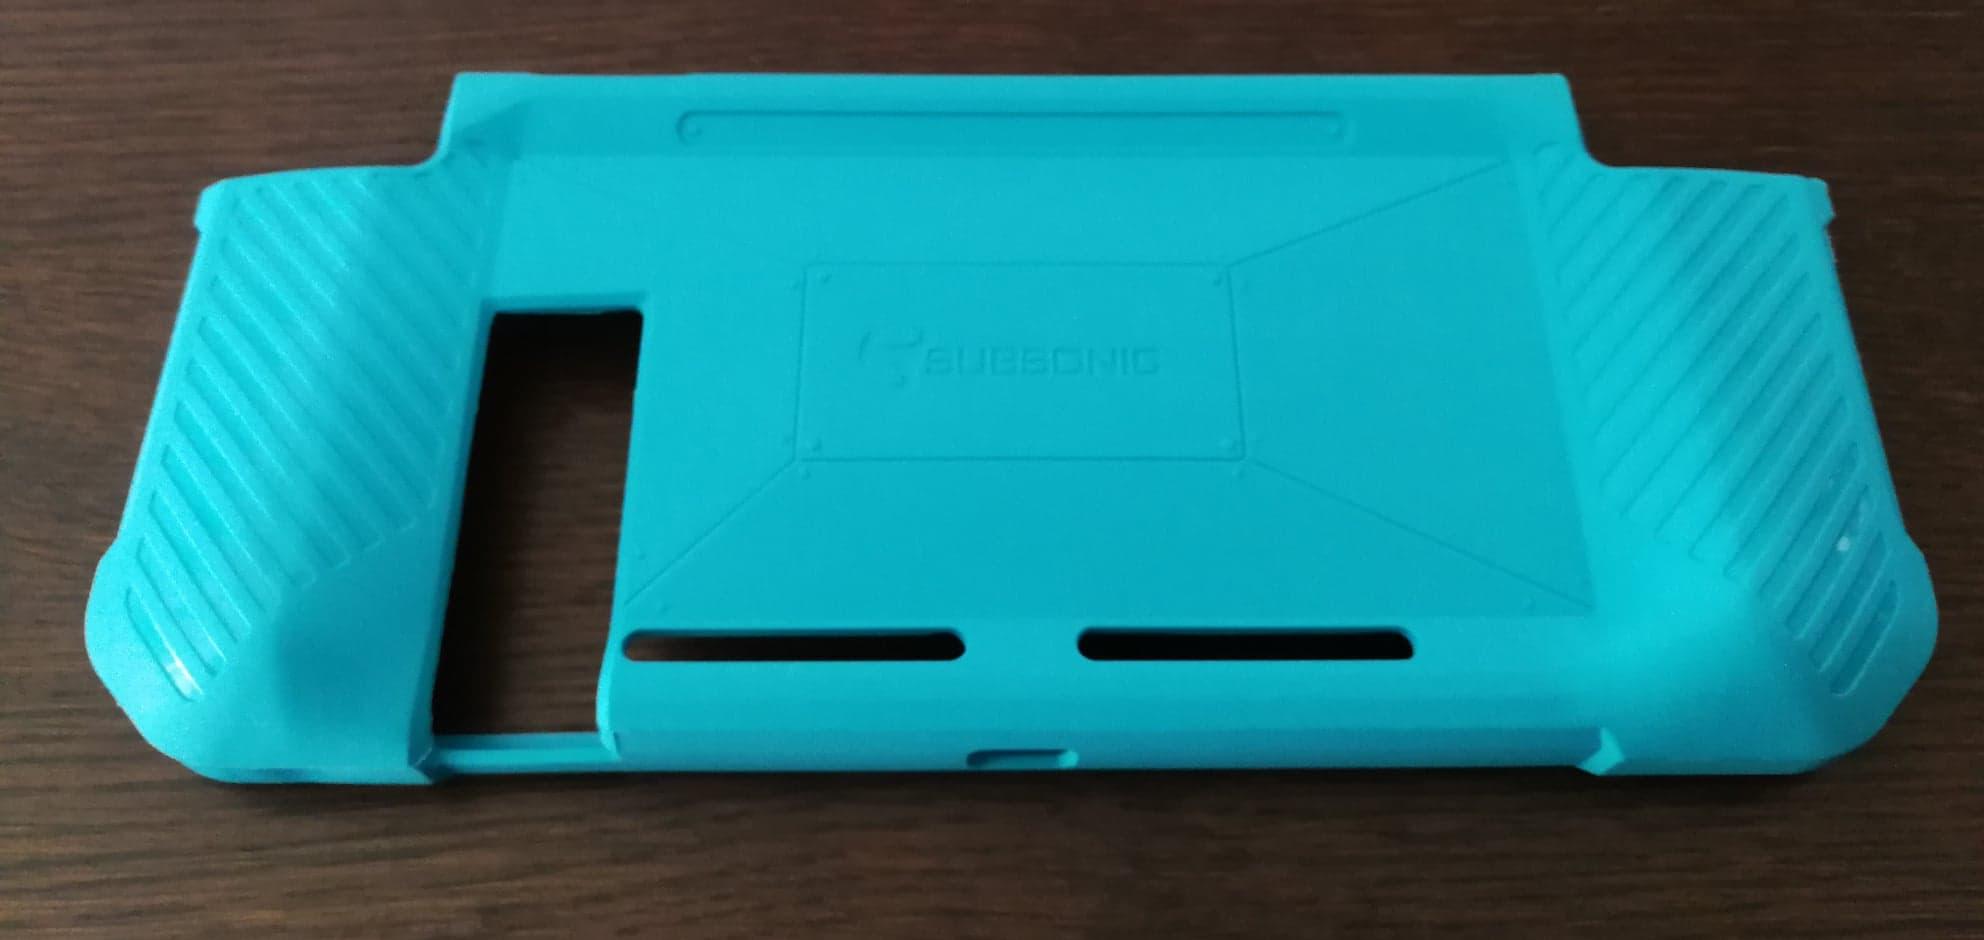 Bumper Case avant l'installation sur la console